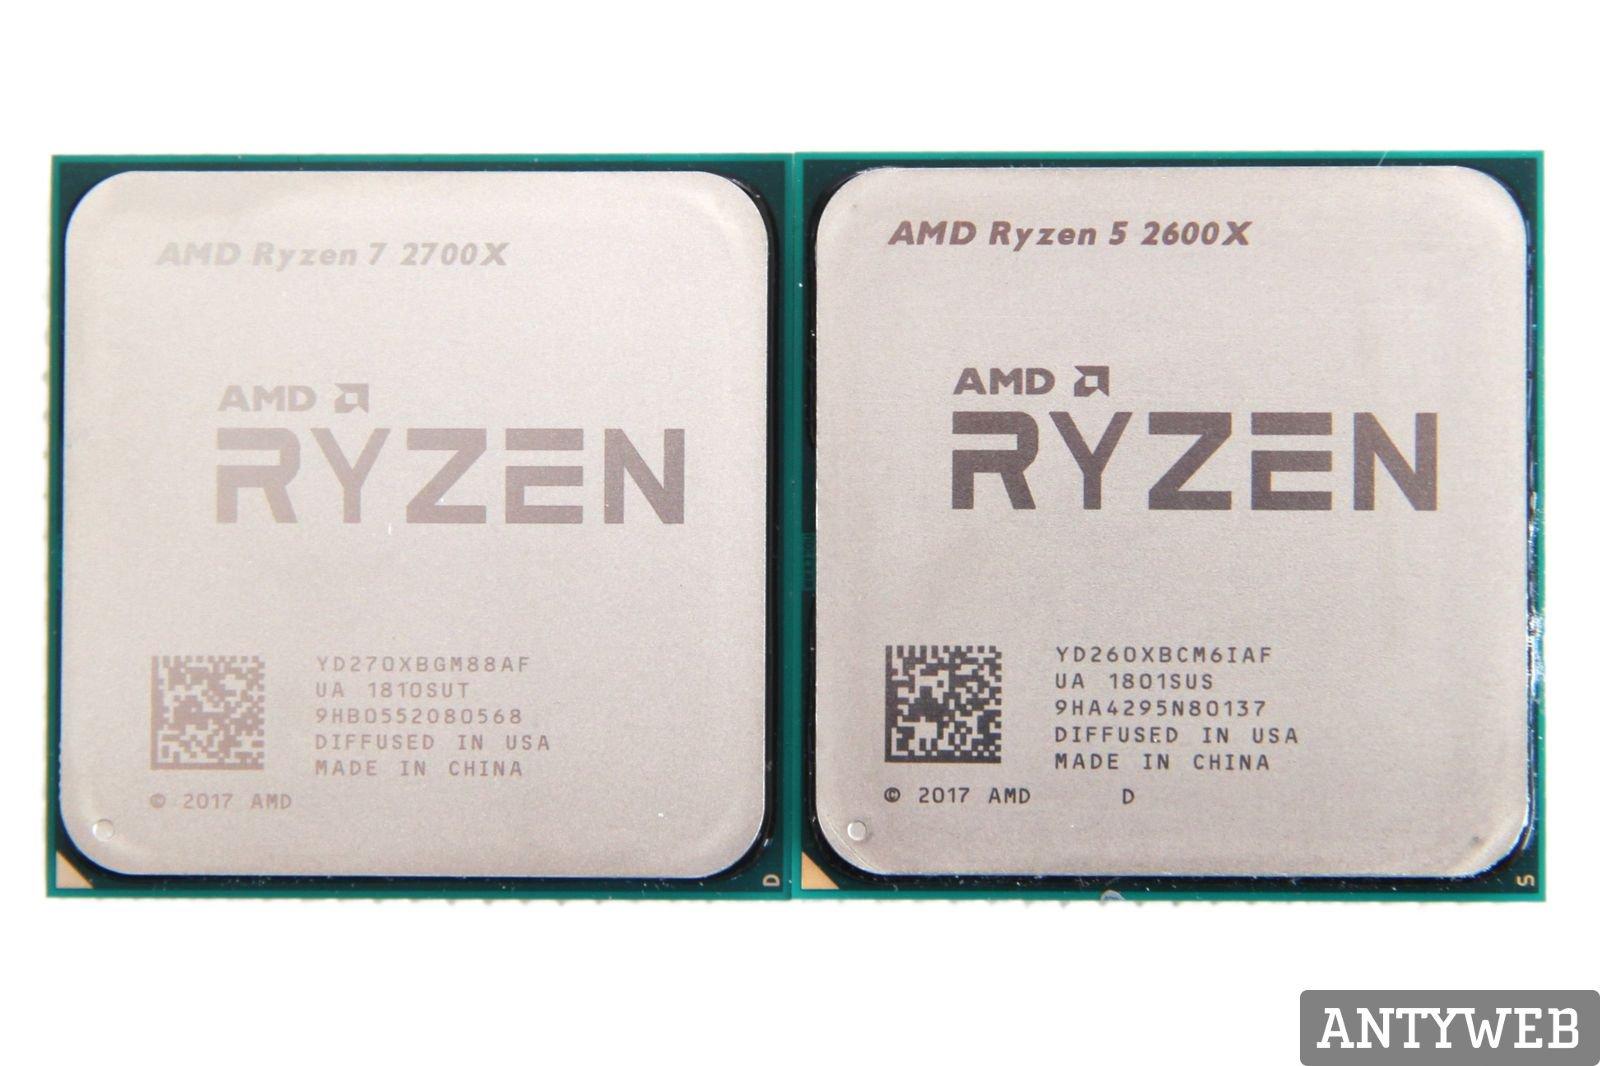 AMD Ryzen 7 2700X iRyzen 5 2600X